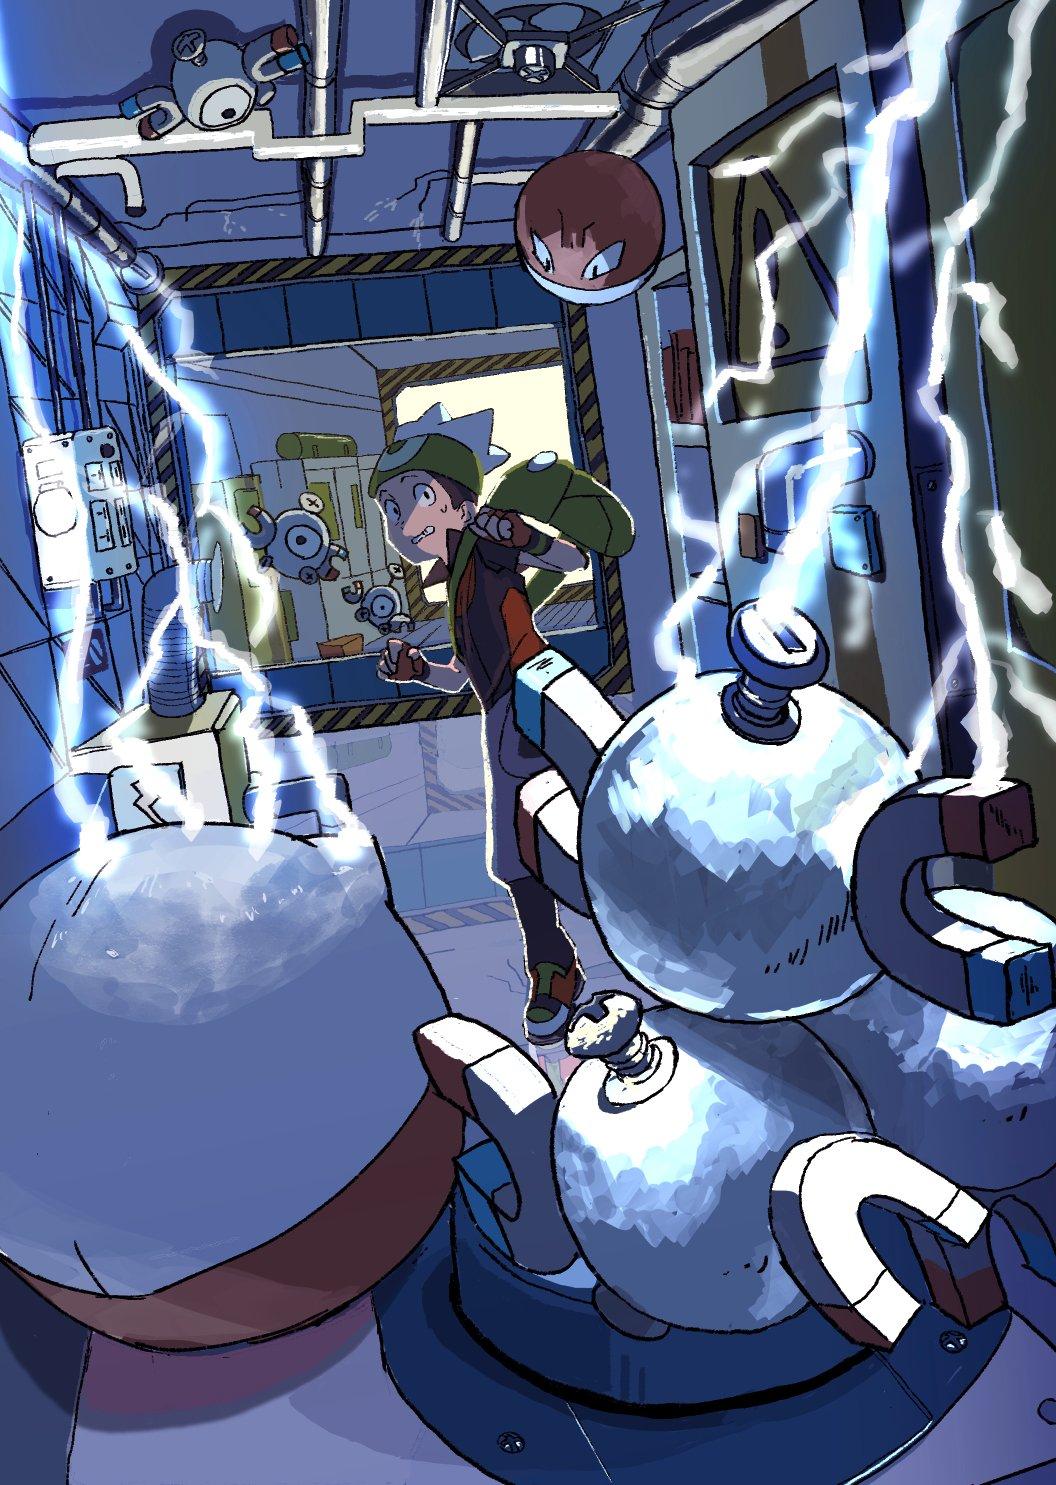 1boy banana_(okashi_to_satougashi) beanie brendan_(pokemon) capri_pants electricity electrode gen_1_pokemon hat highres holding holding_poke_ball indoors looking_back magnemite magneton pants parted_lips pipe poke_ball poke_ball_(basic) pokemon pokemon_(creature) pokemon_(game) pokemon_emerald pokemon_rse reflective_floor shoes sweatdrop teeth voltorb white_headwear worried